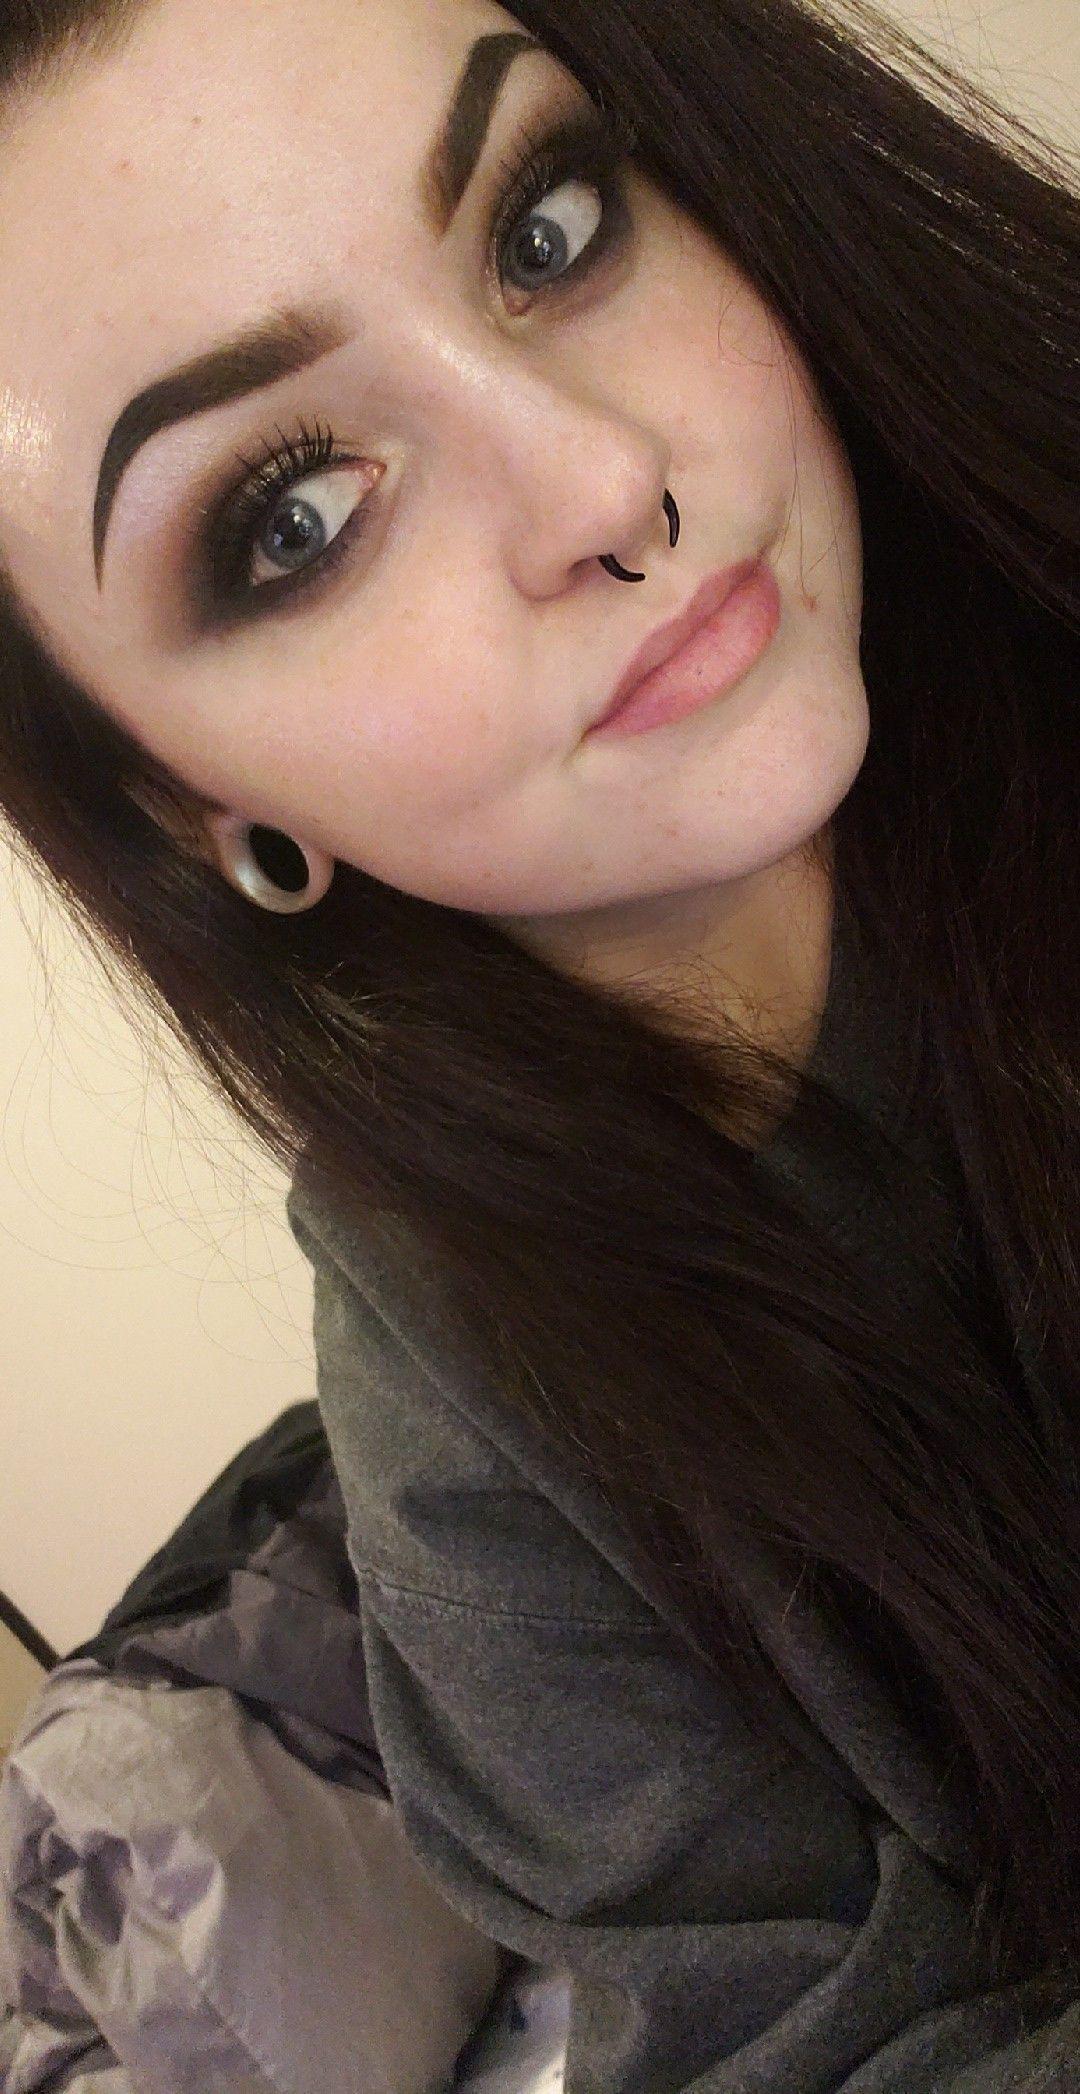 #girlswithpiercings #septumpiercing #peircings #alternative #alt #girlswithgauges #stretchedlobes #grunge #smokeyeye #makeup #eyebrows